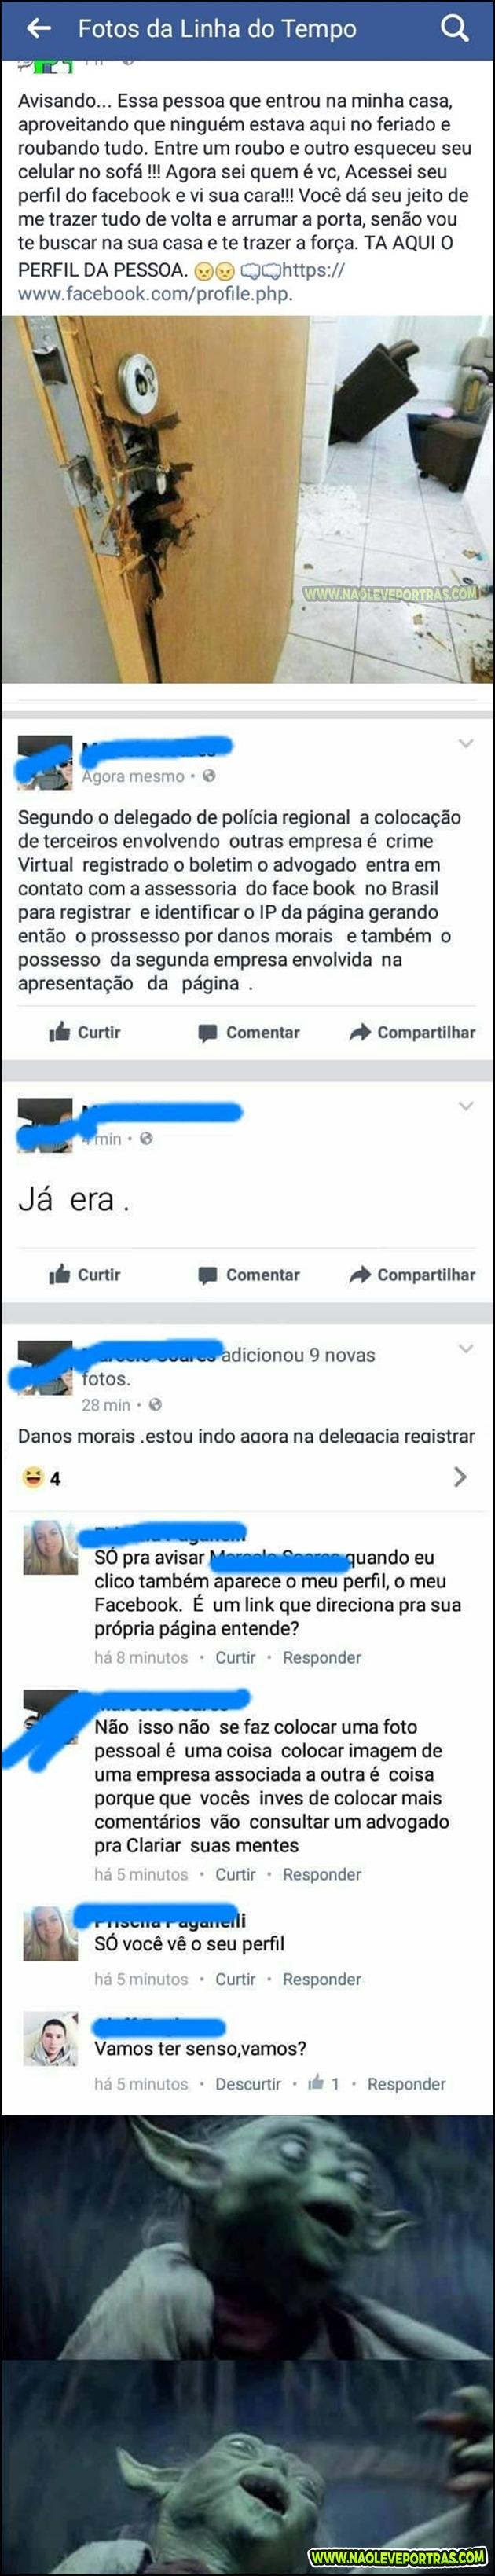 treta no facebook